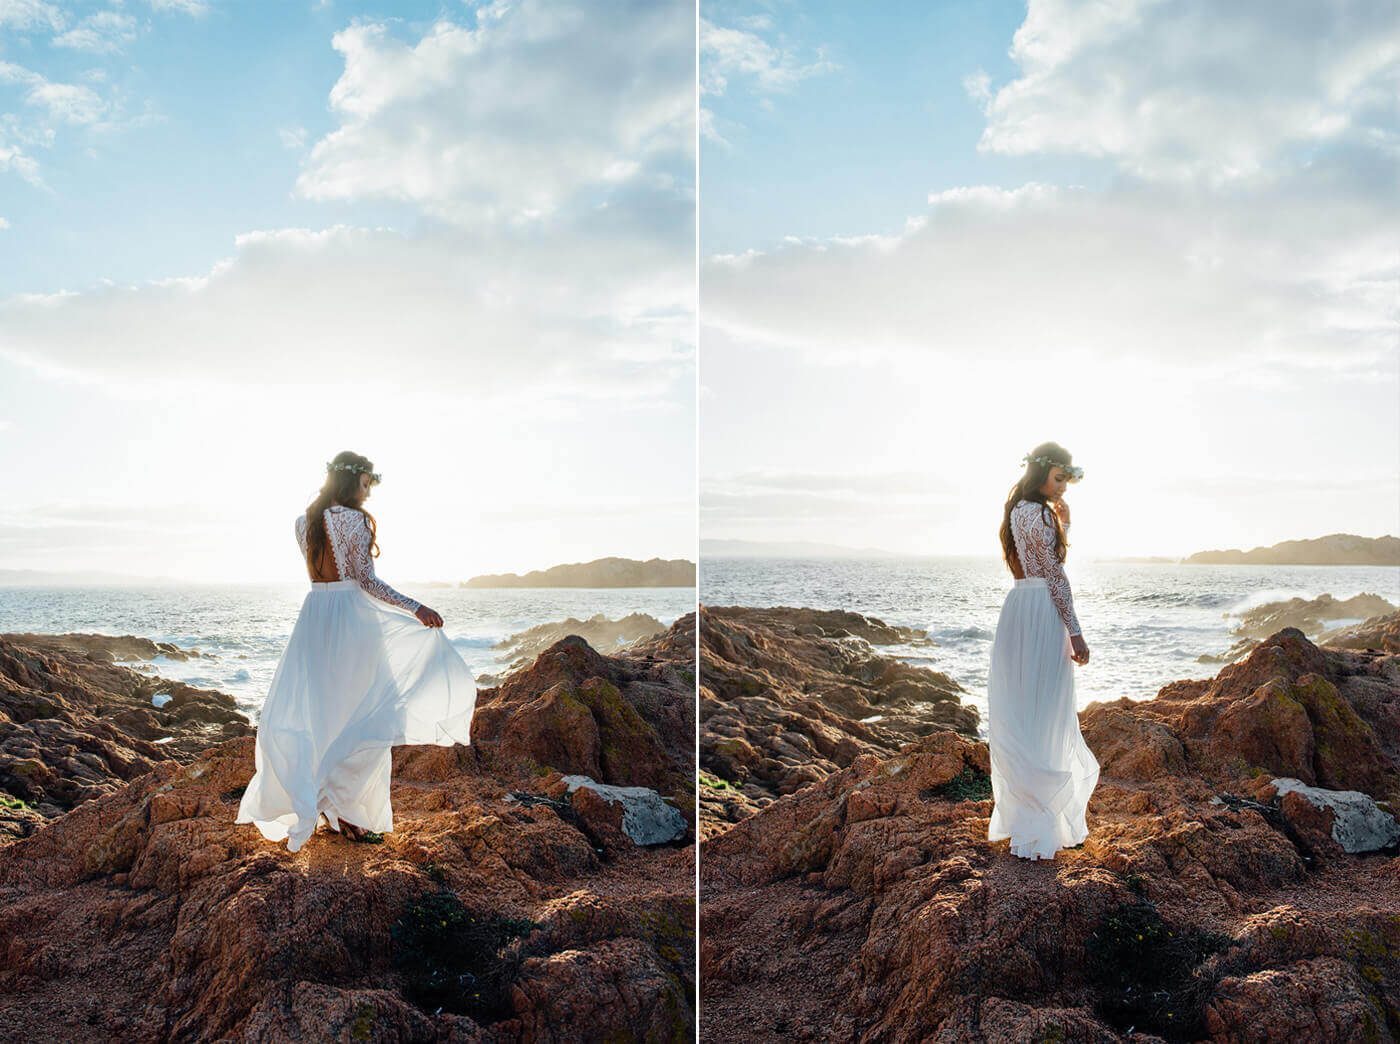 Destination_wedding_Bruiloft_Italie_Italy_Styledwedding_Bruidsfotograaf_Nijmegen_11